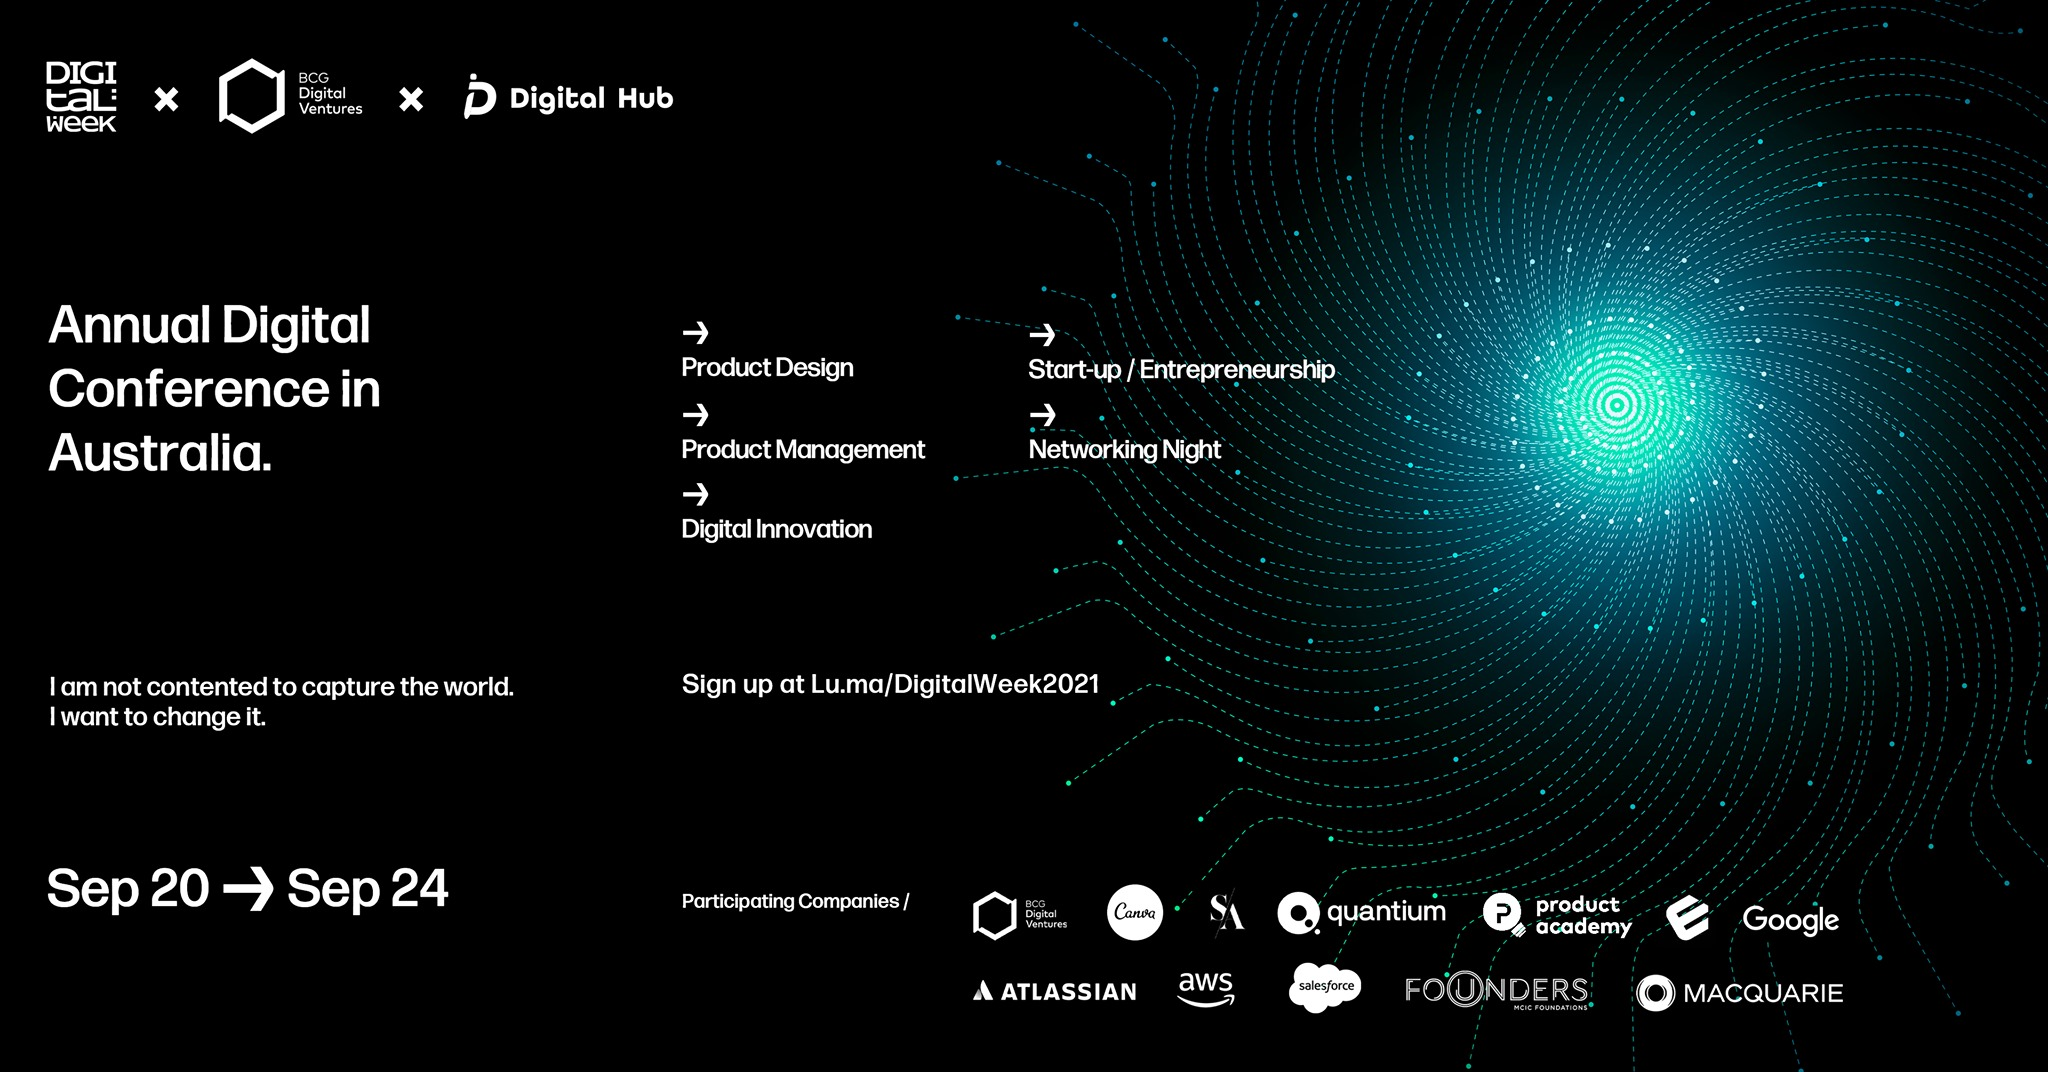 Digital Week 2021: Annual Digital Conference in Australia